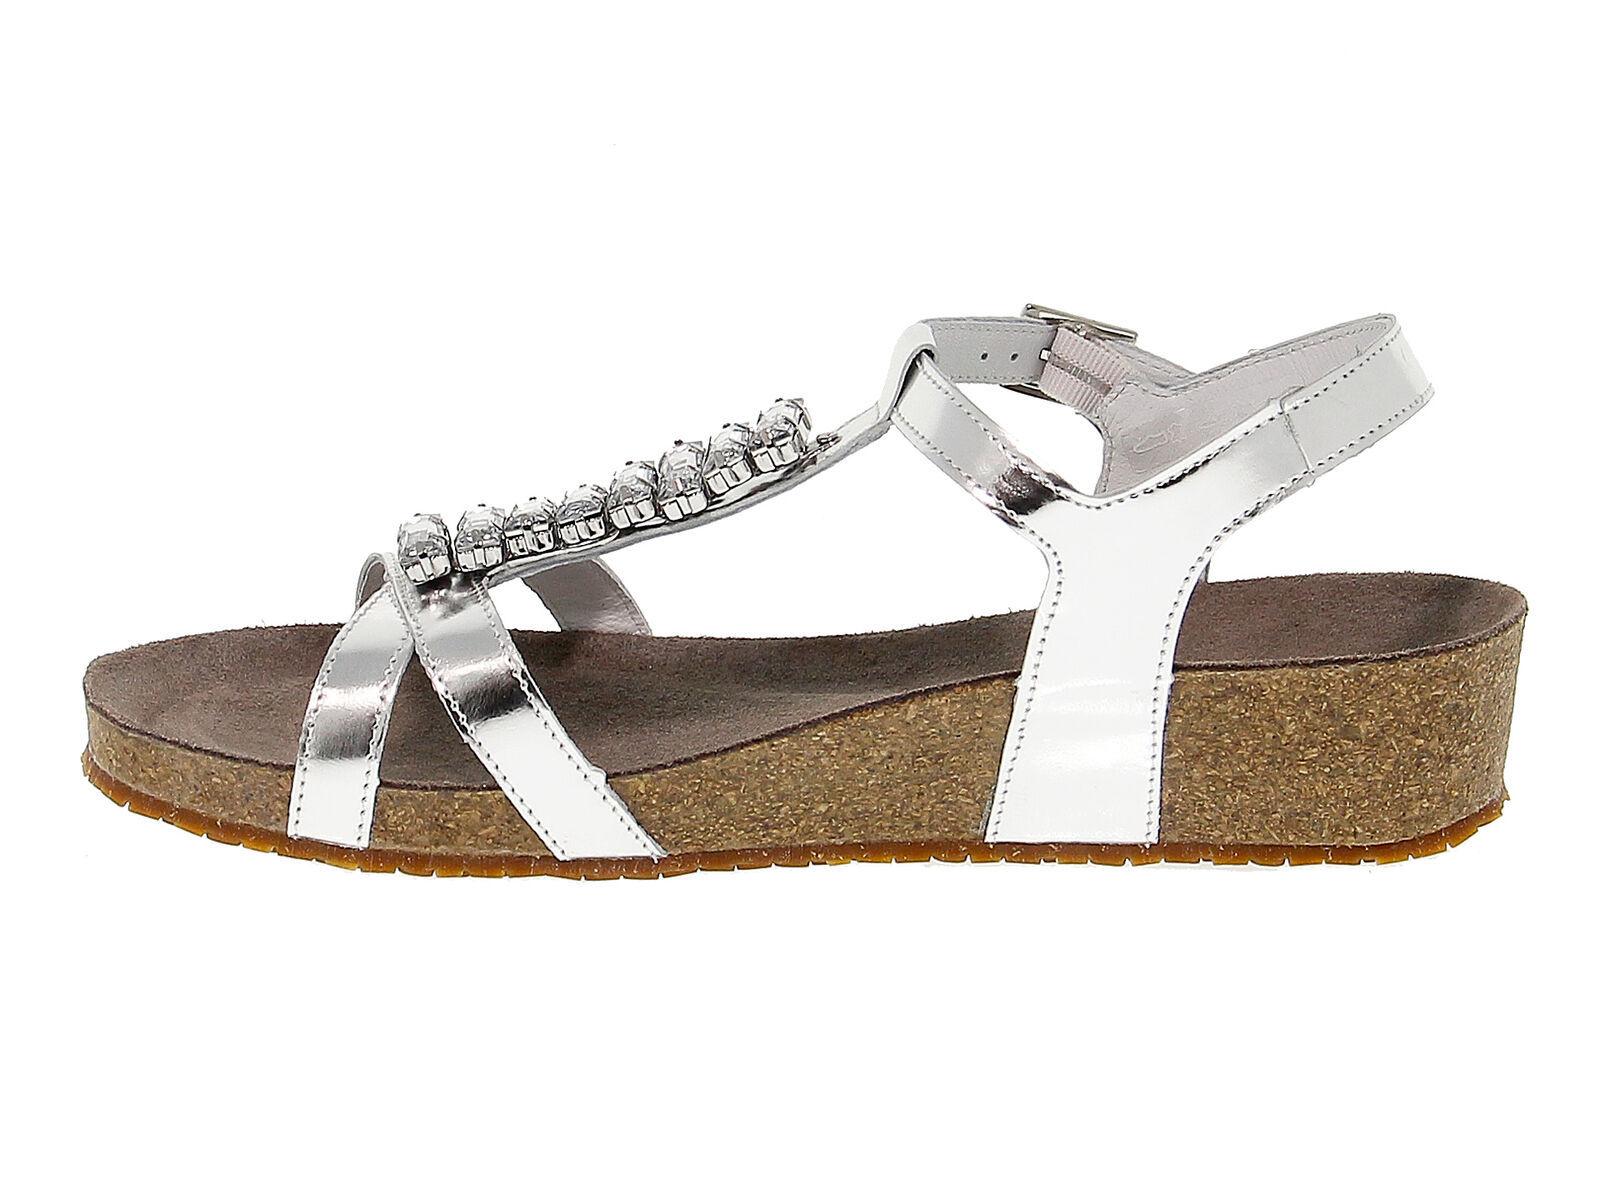 Flache Sandalen MEPHISTO IBELLA in argento leder - Schuhe Damen